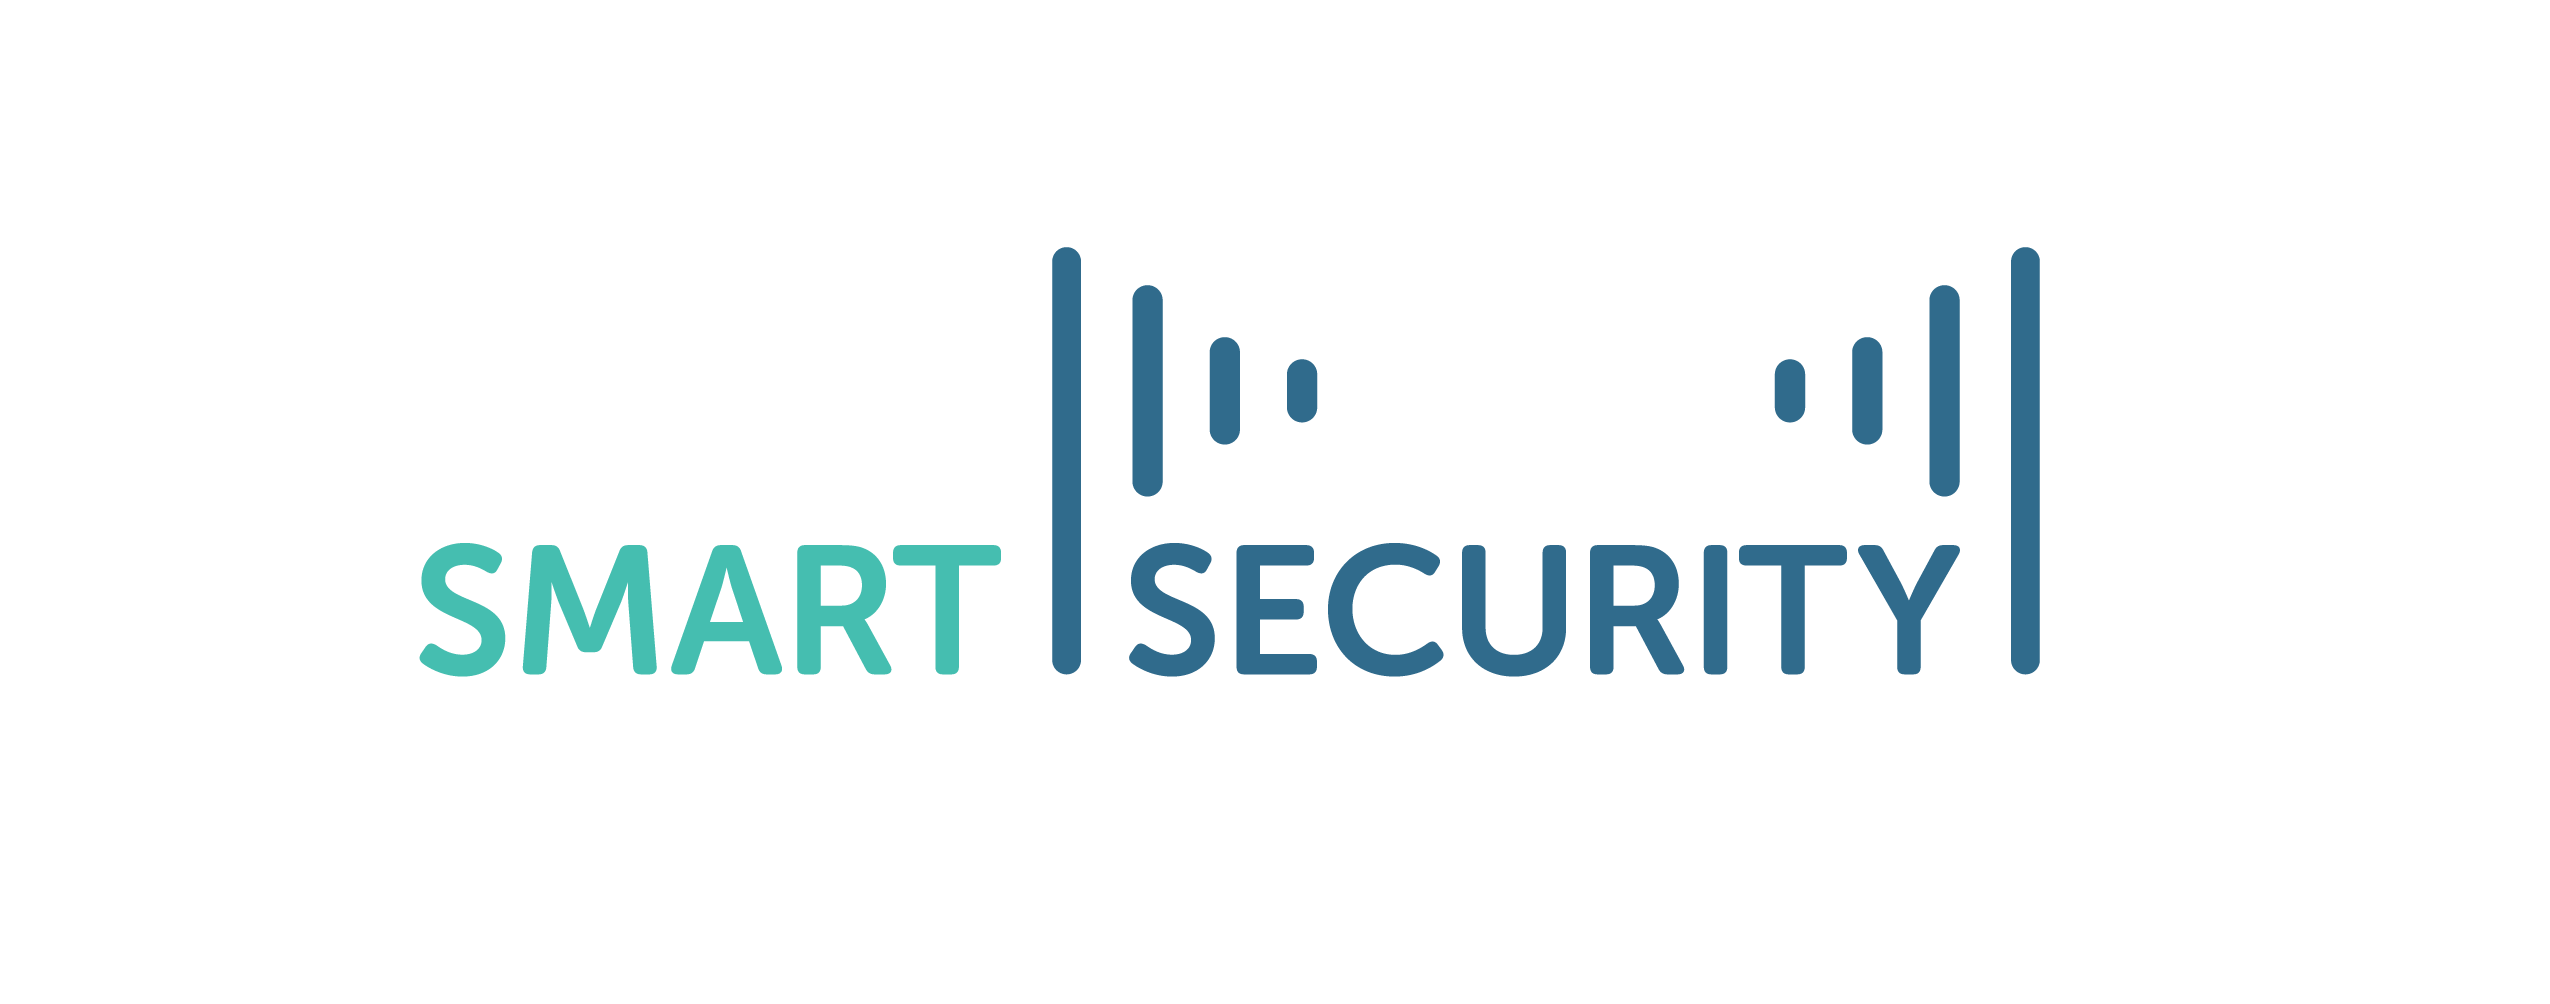 SmartSecurity_RBG_SCREEN-USE